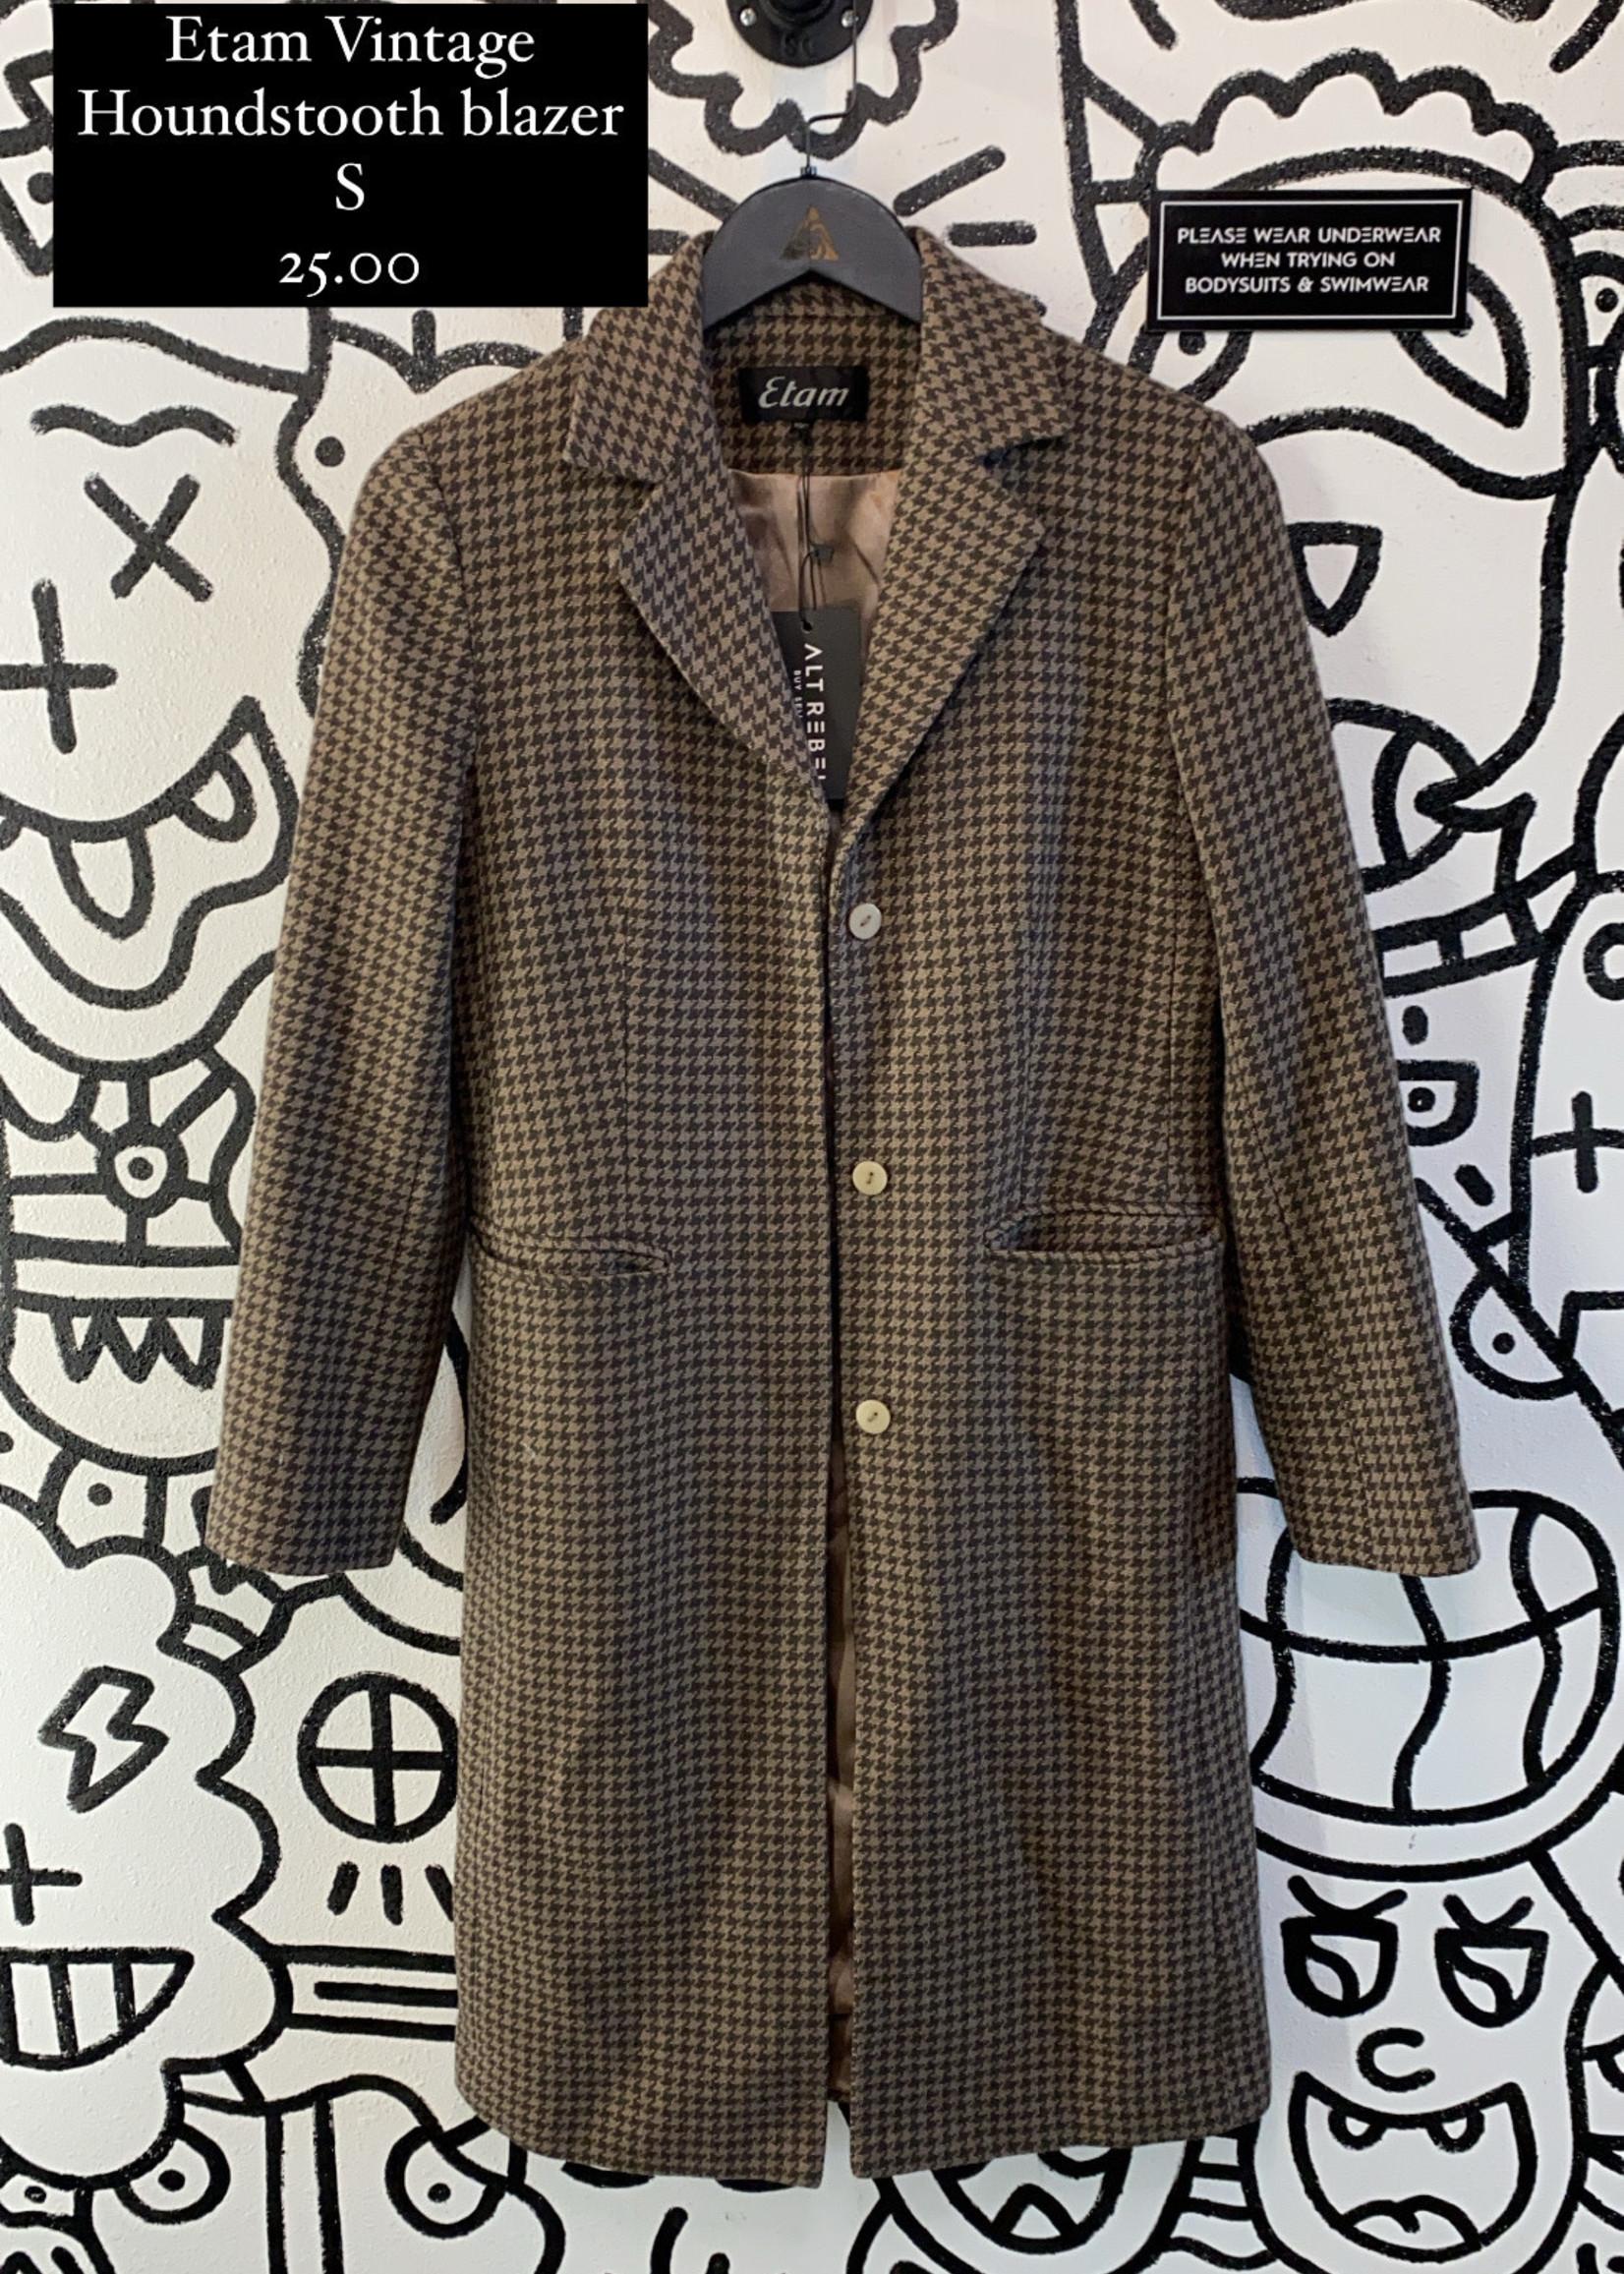 Etam Vintage Houndstooth Long Blazer S